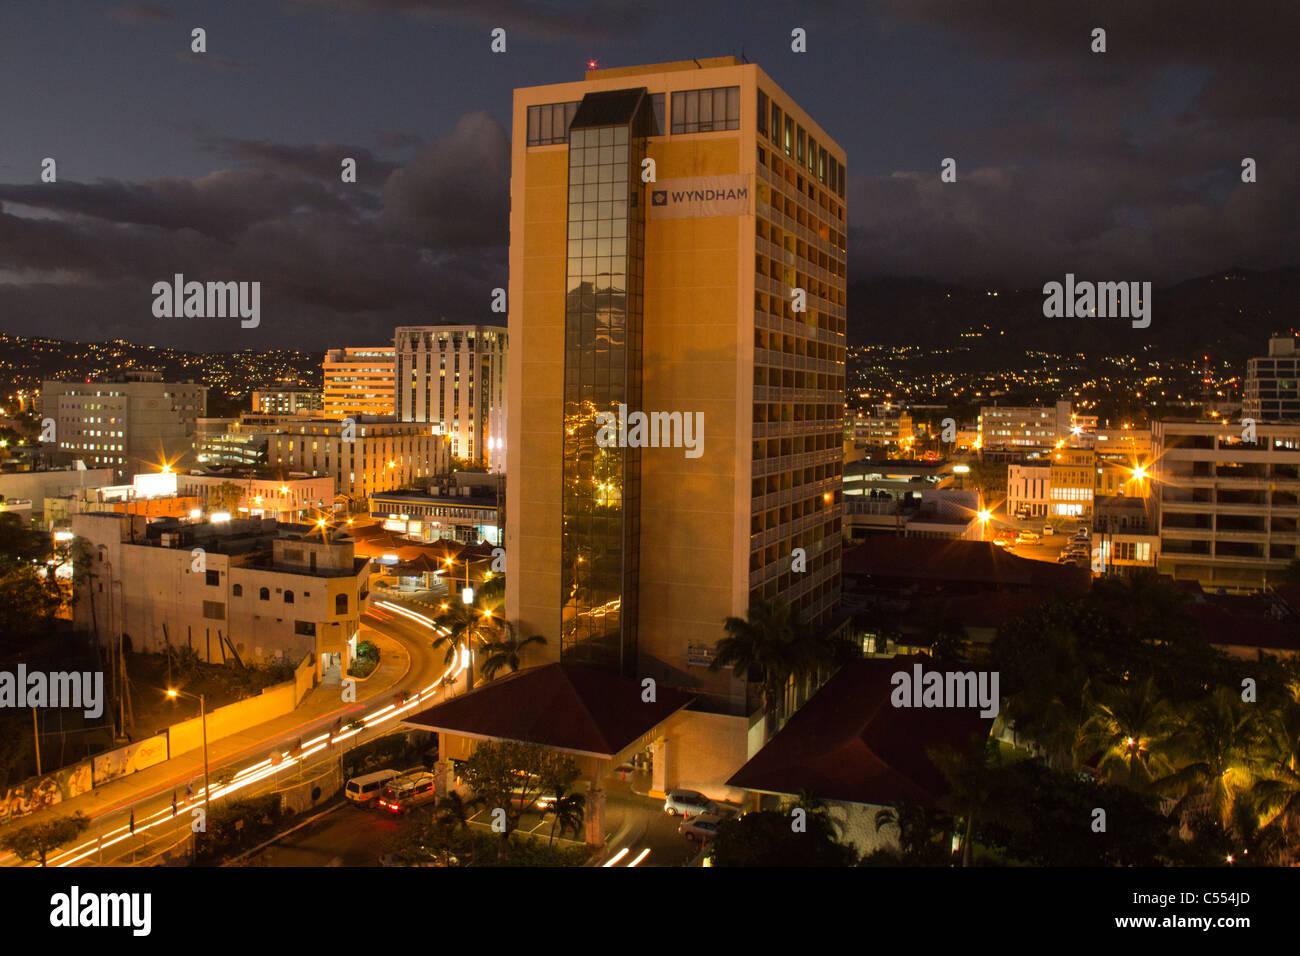 Kingston Jamaica Street Stock Photos & Kingston Jamaica Street Stock ...